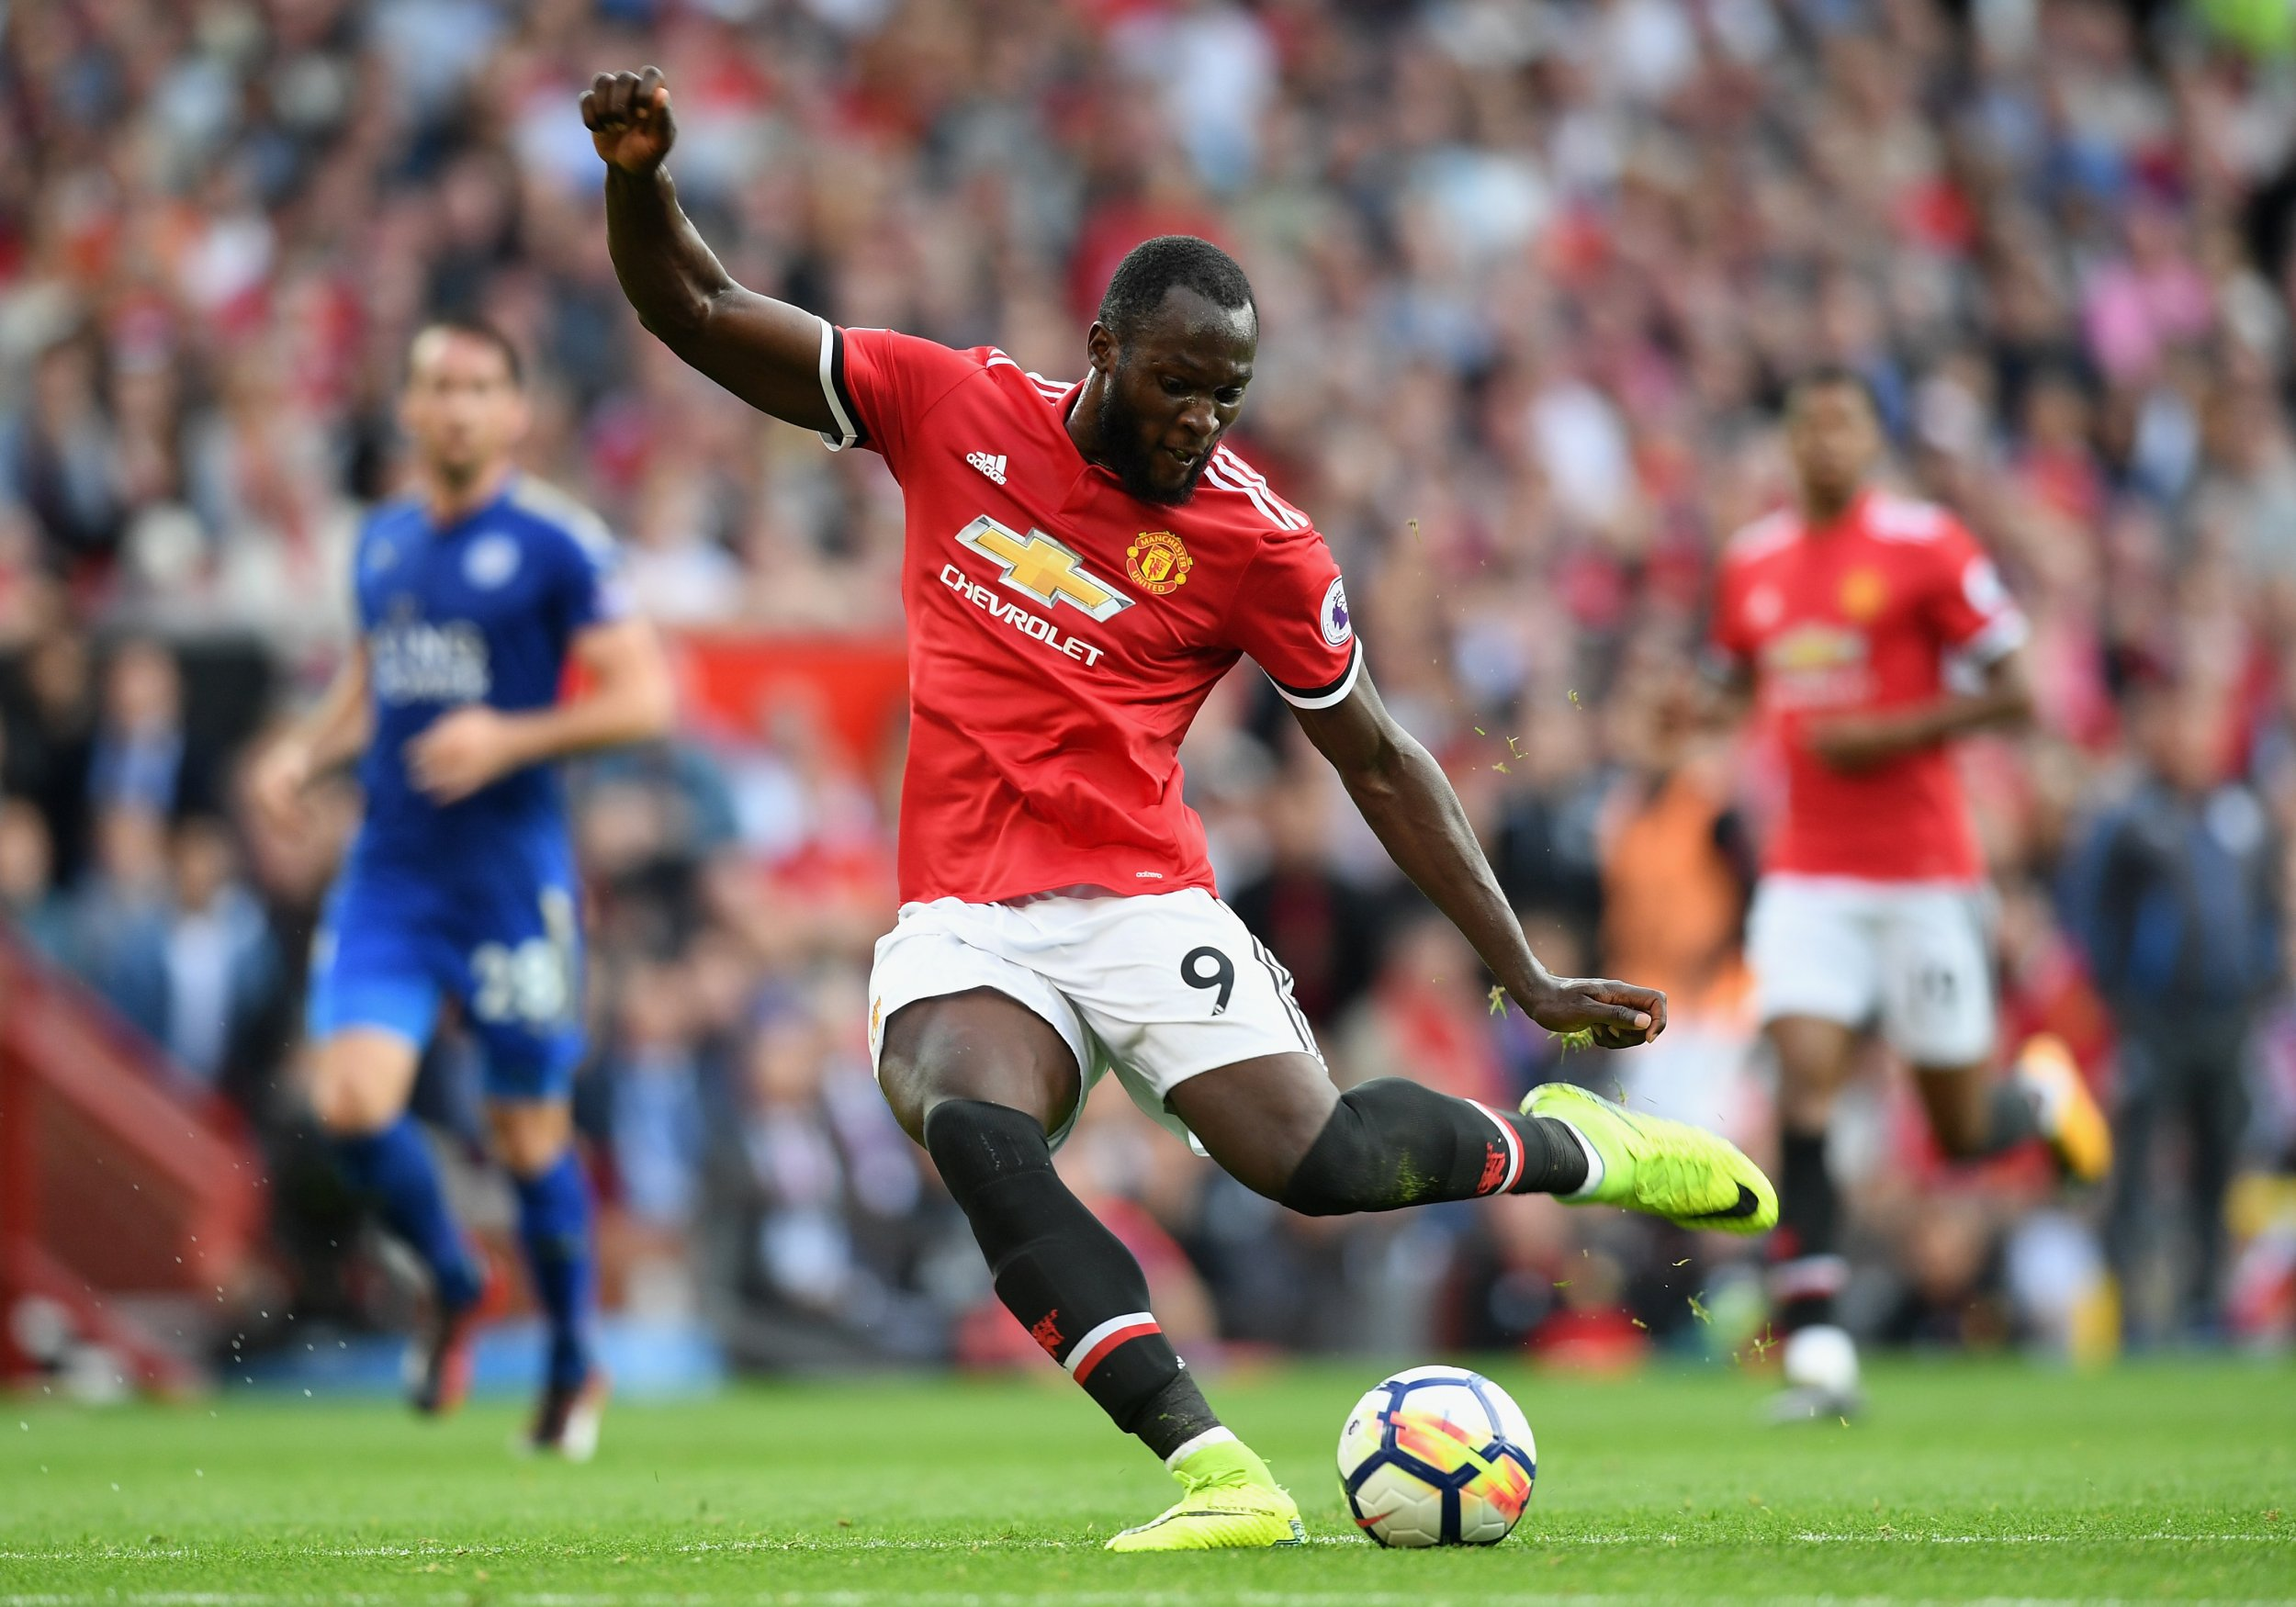 Romelu Lukaku of Manchester United in Manchester, England, August 26.